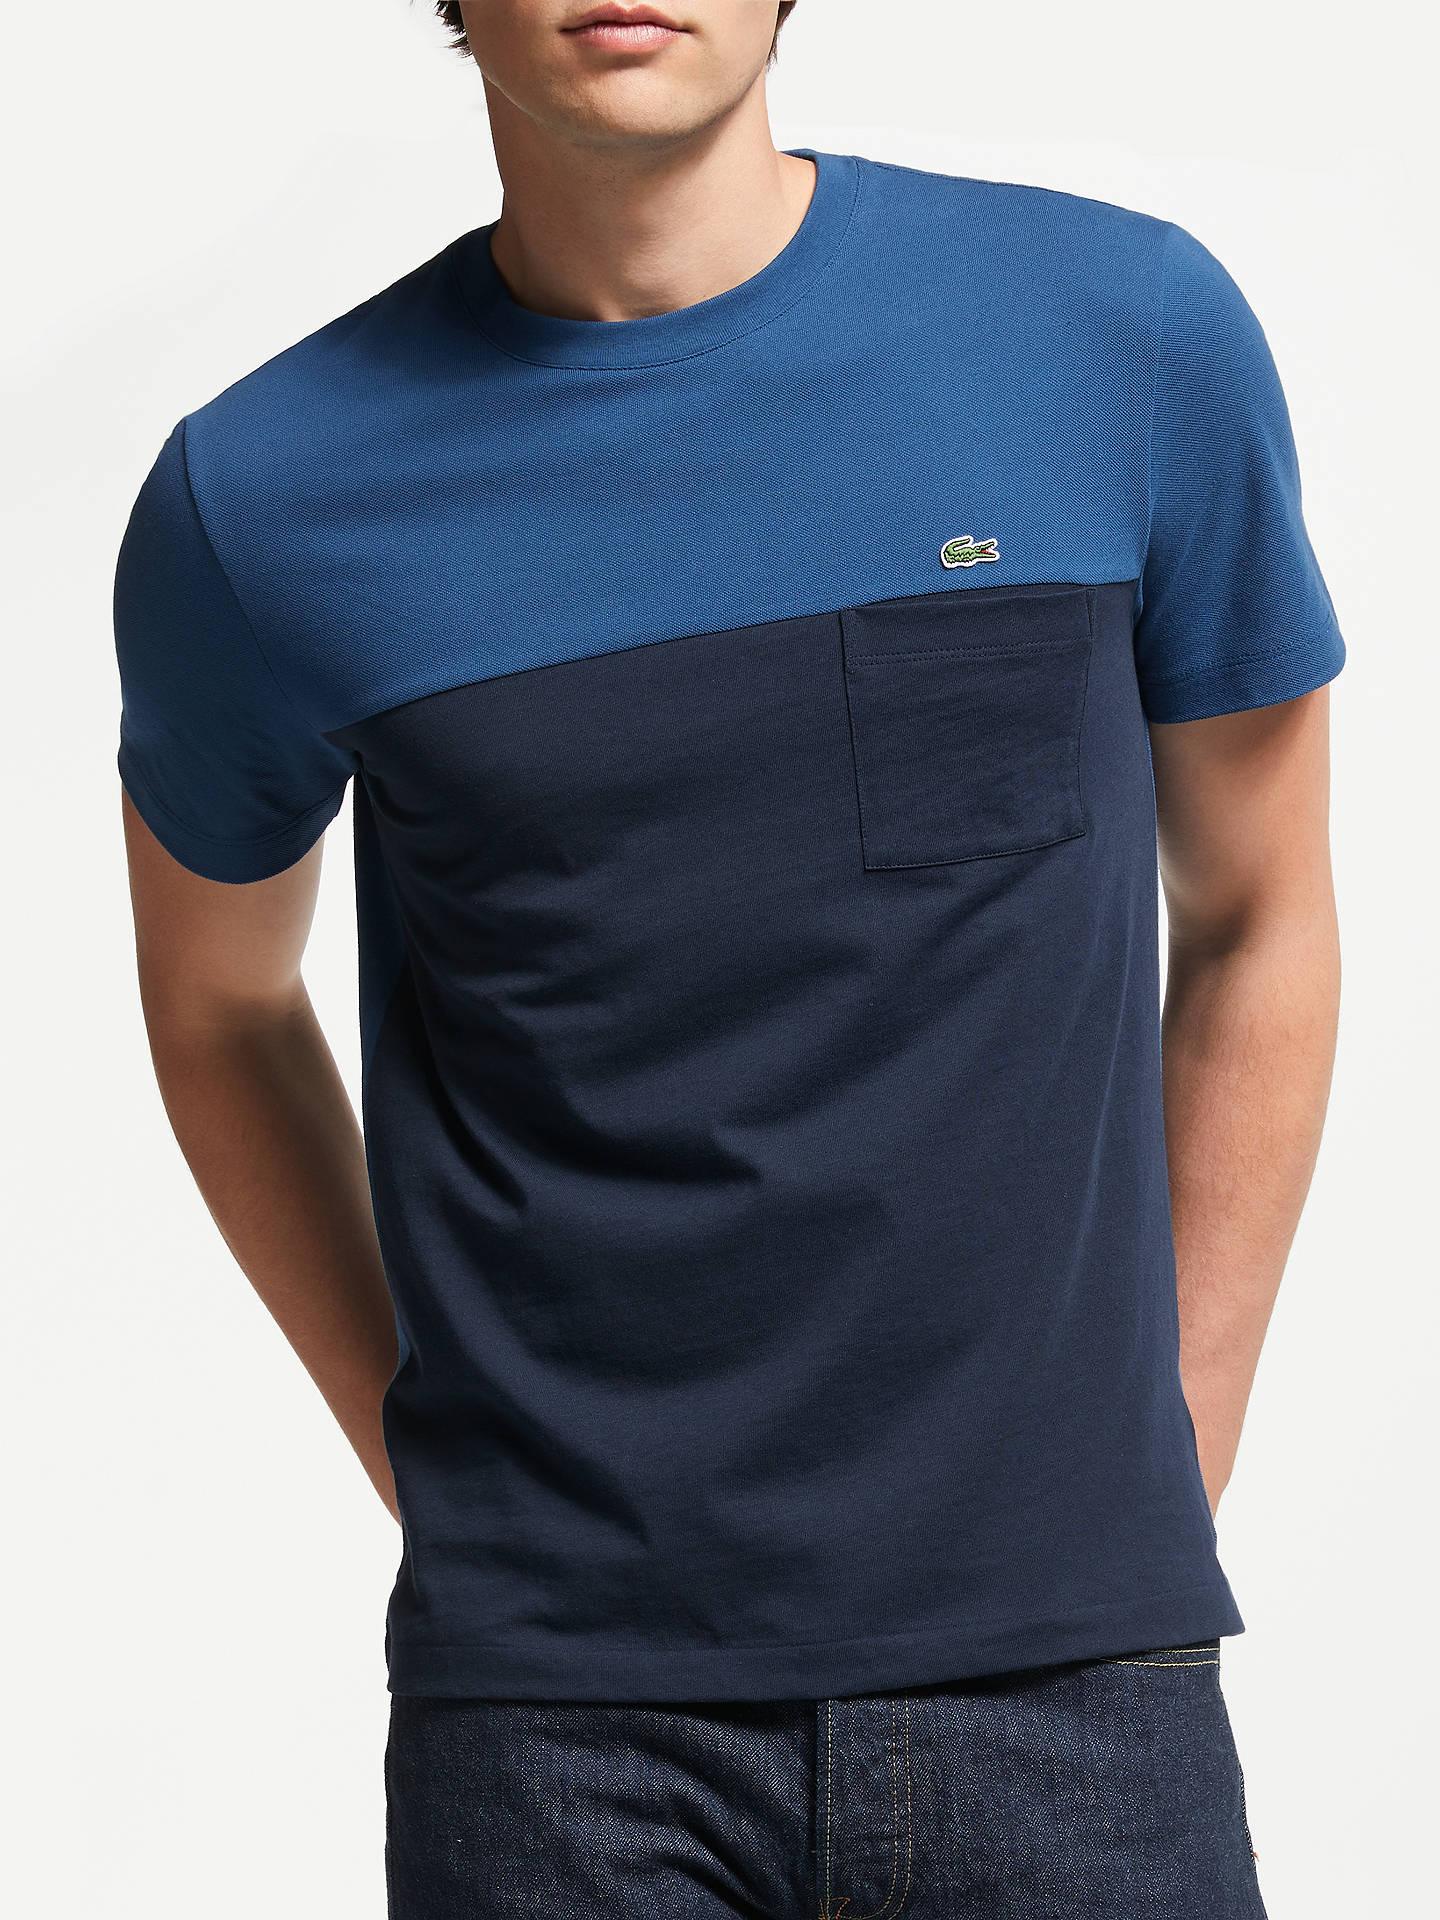 b53199f7 Buy Lacoste Short Sleeve Colour Block T-Shirt, Blue/Black, S Online ...